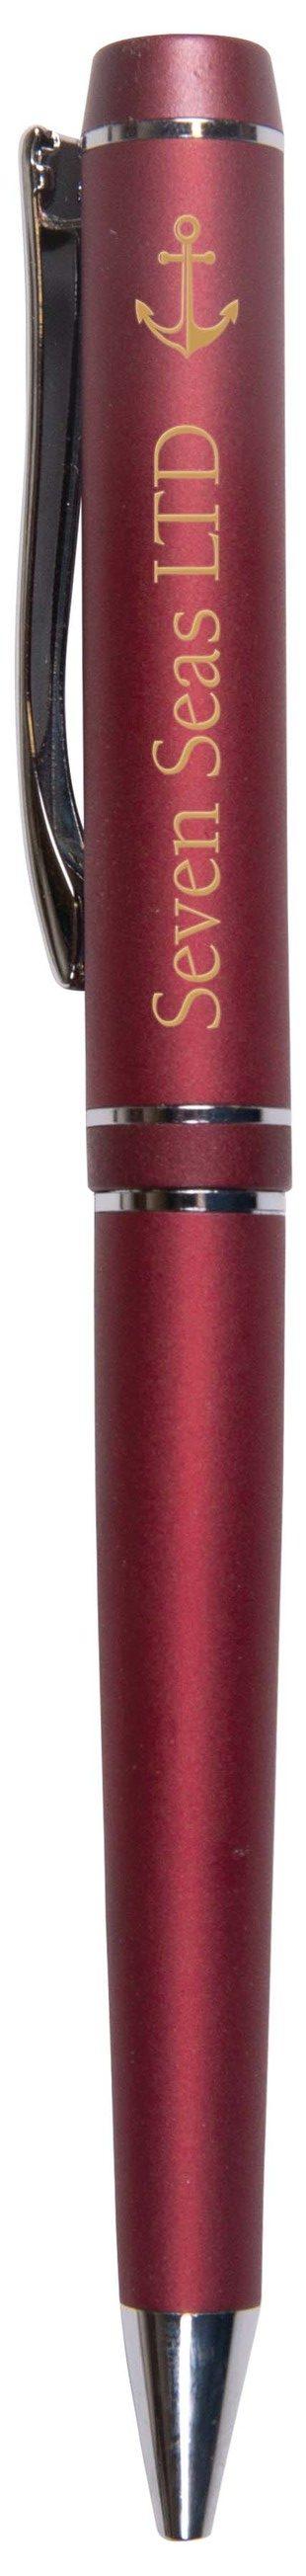 Metal Pen 3